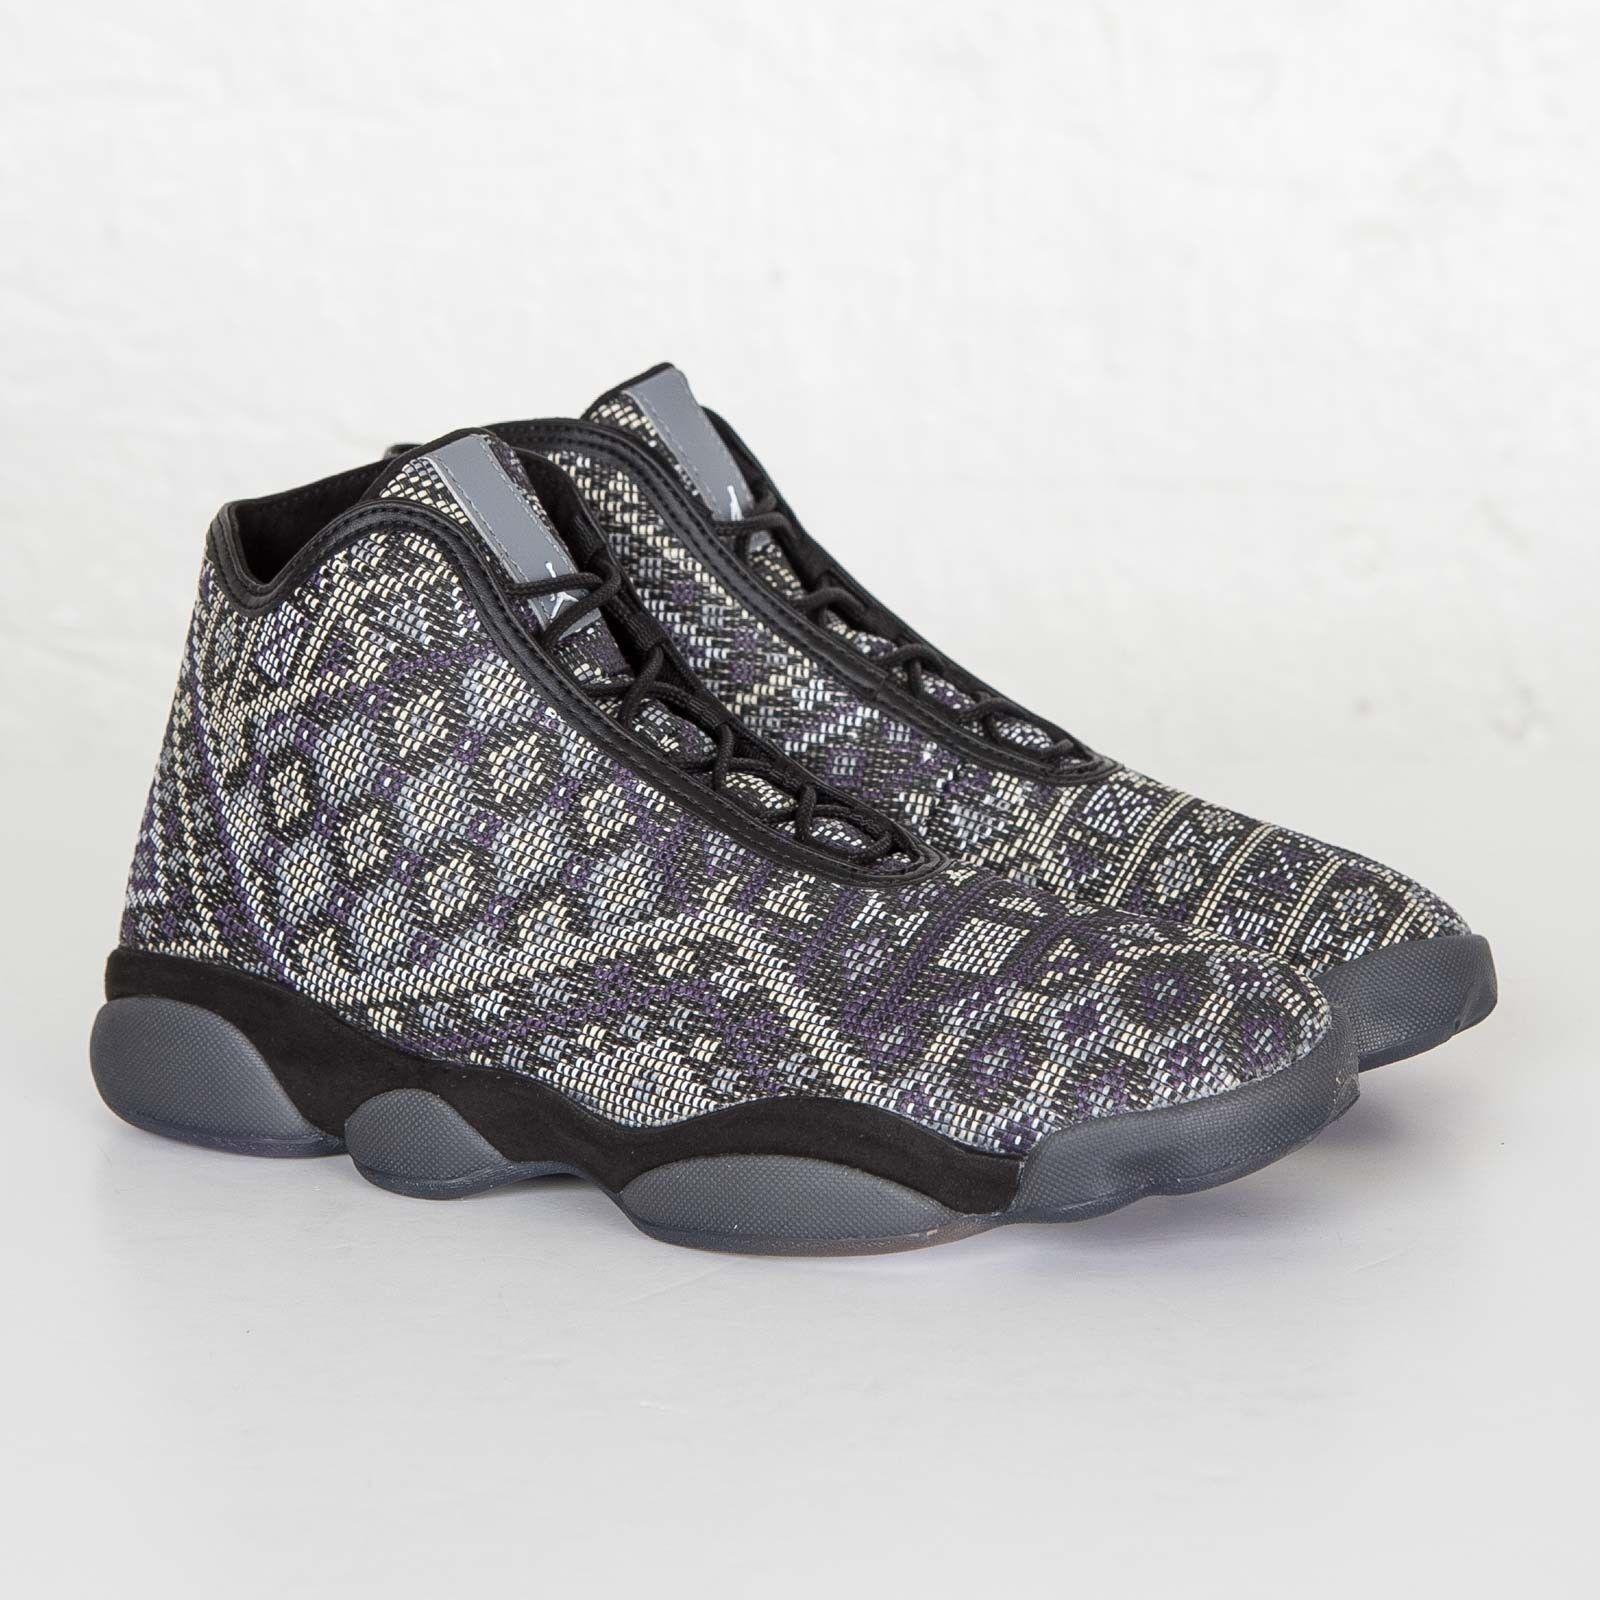 822333-022 Jordan Men Horizon Premium Black Light Charcoal Purple Steel